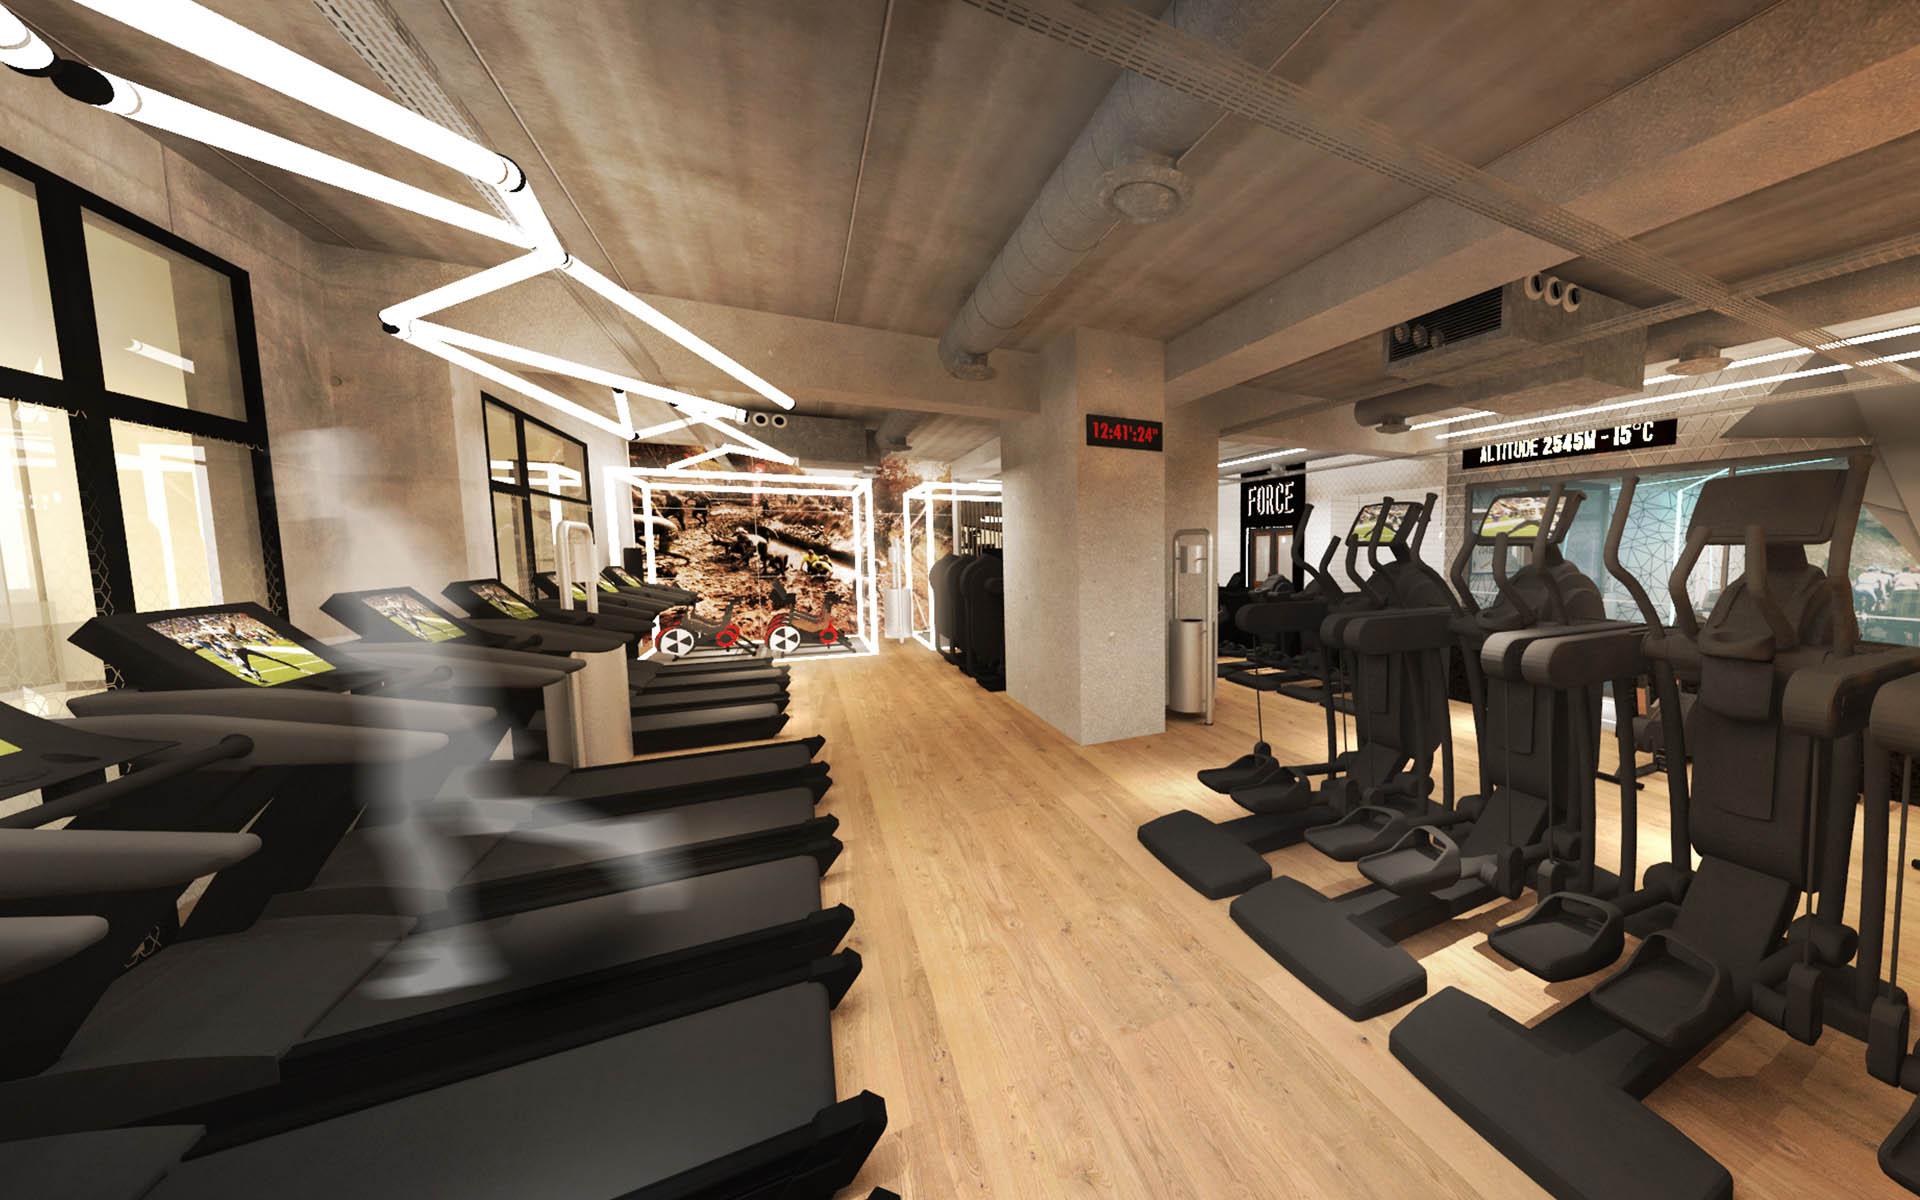 metabolik concept de salle de sport aix en provence red banana studio concepteur d 39 int rieur. Black Bedroom Furniture Sets. Home Design Ideas